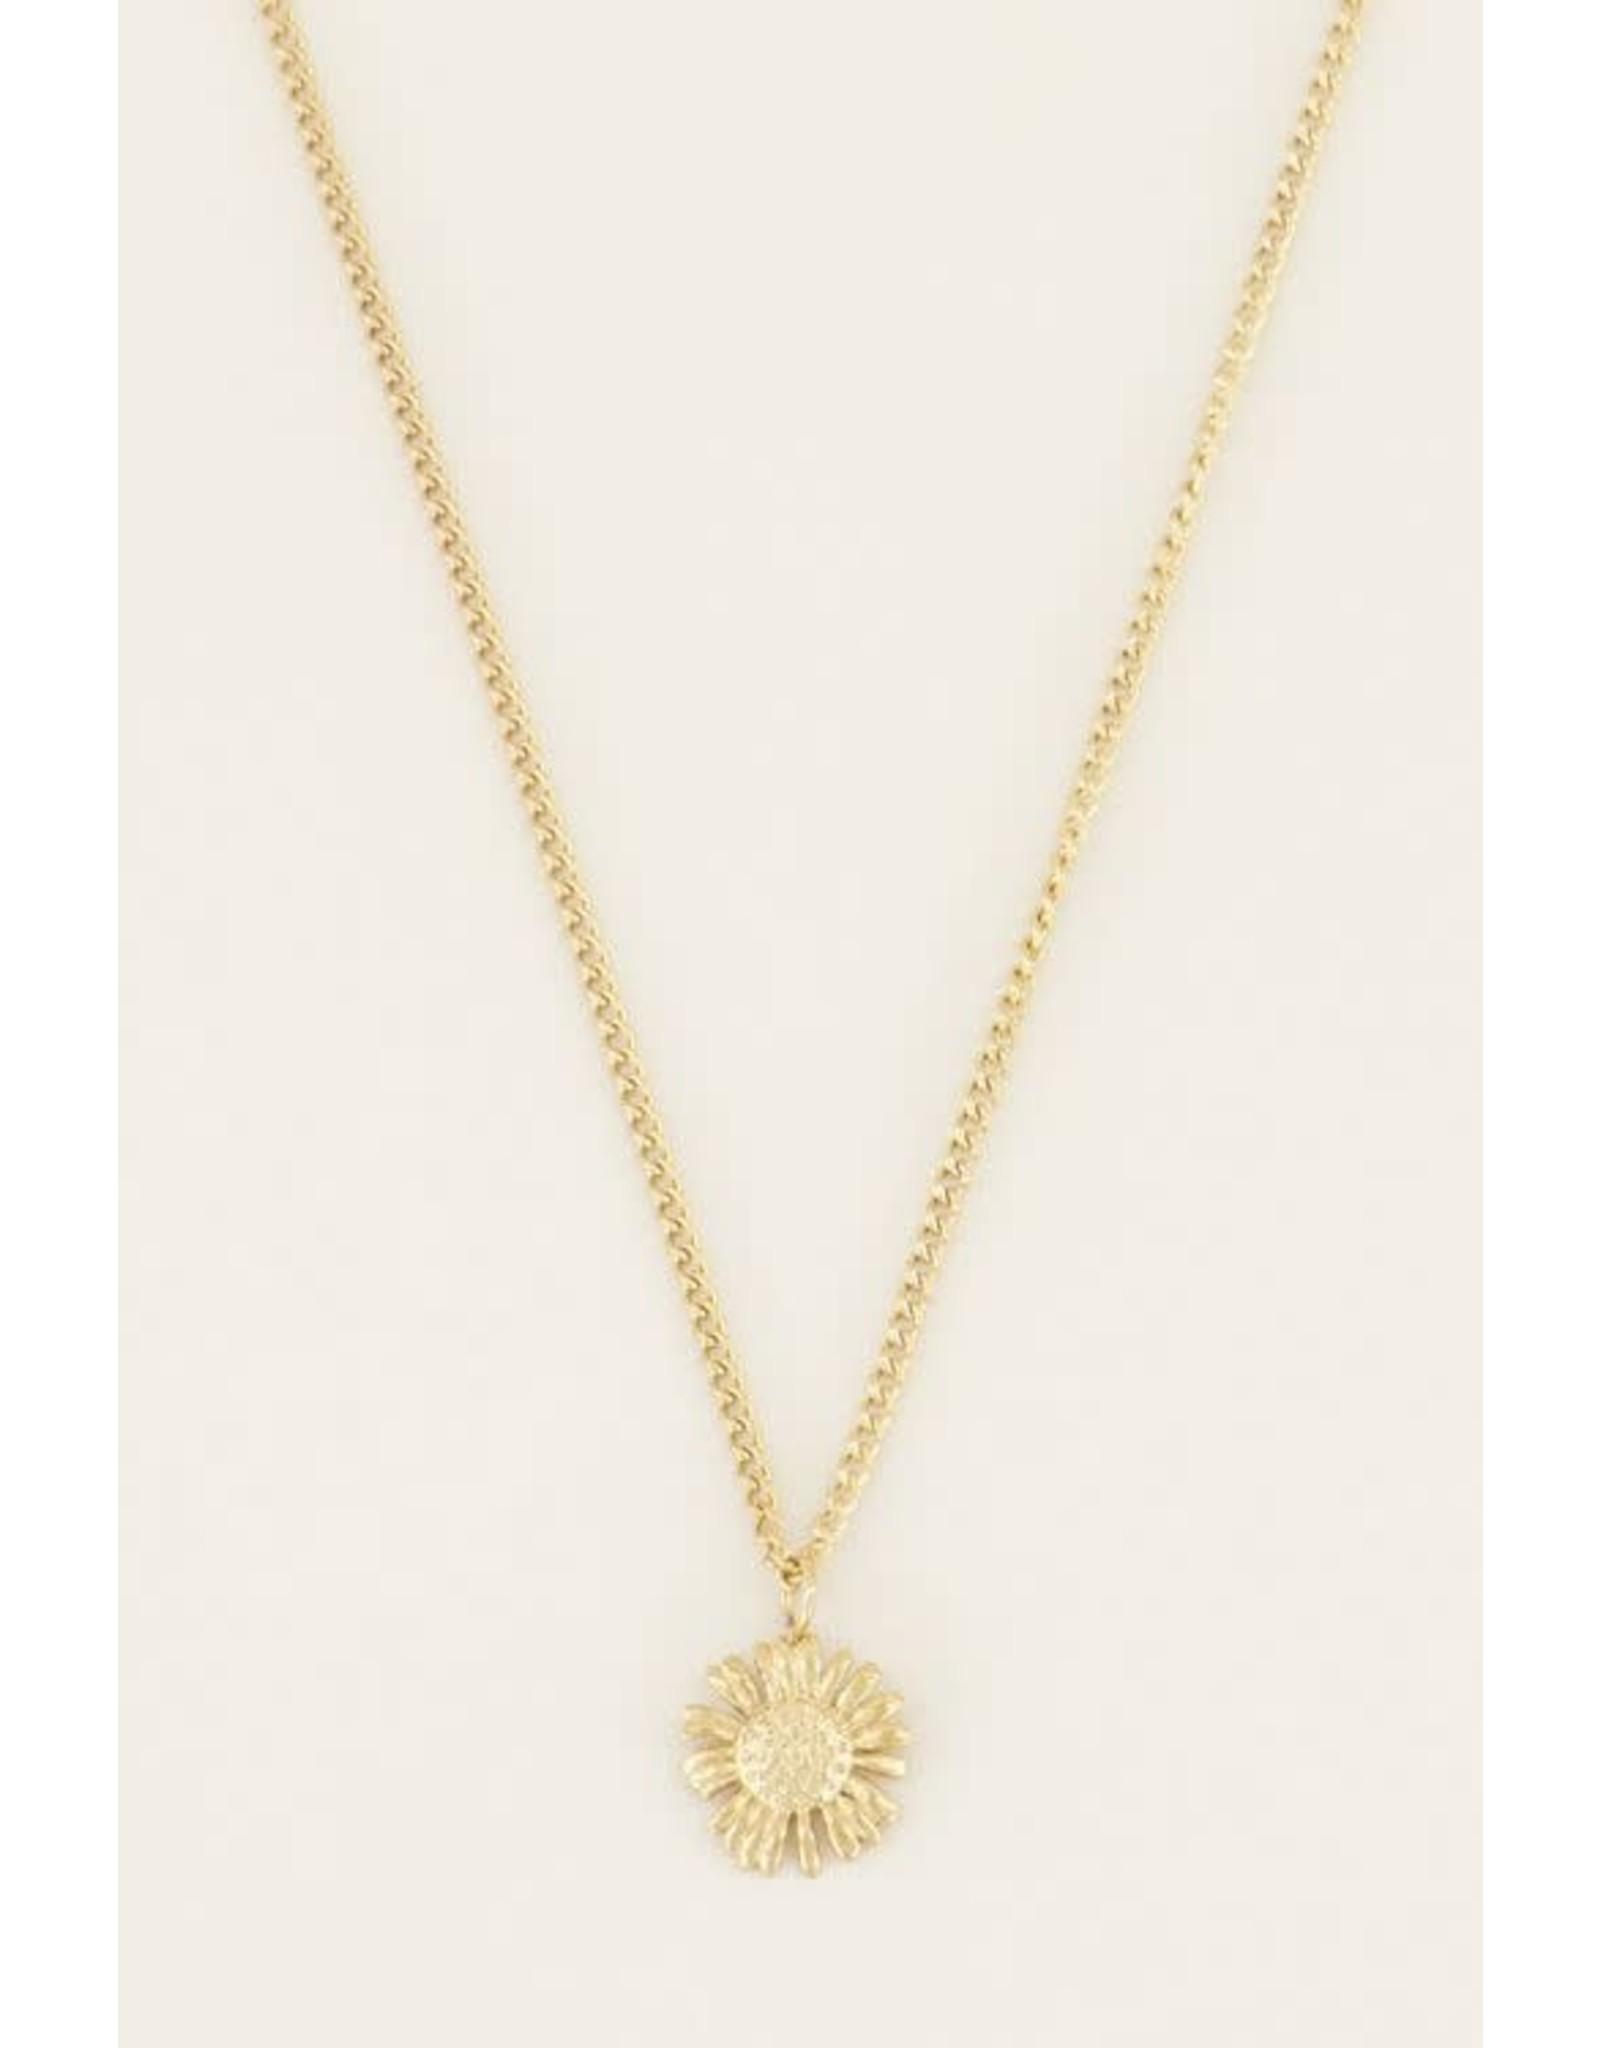 My Jewellery My Jewellery ketting - daisy